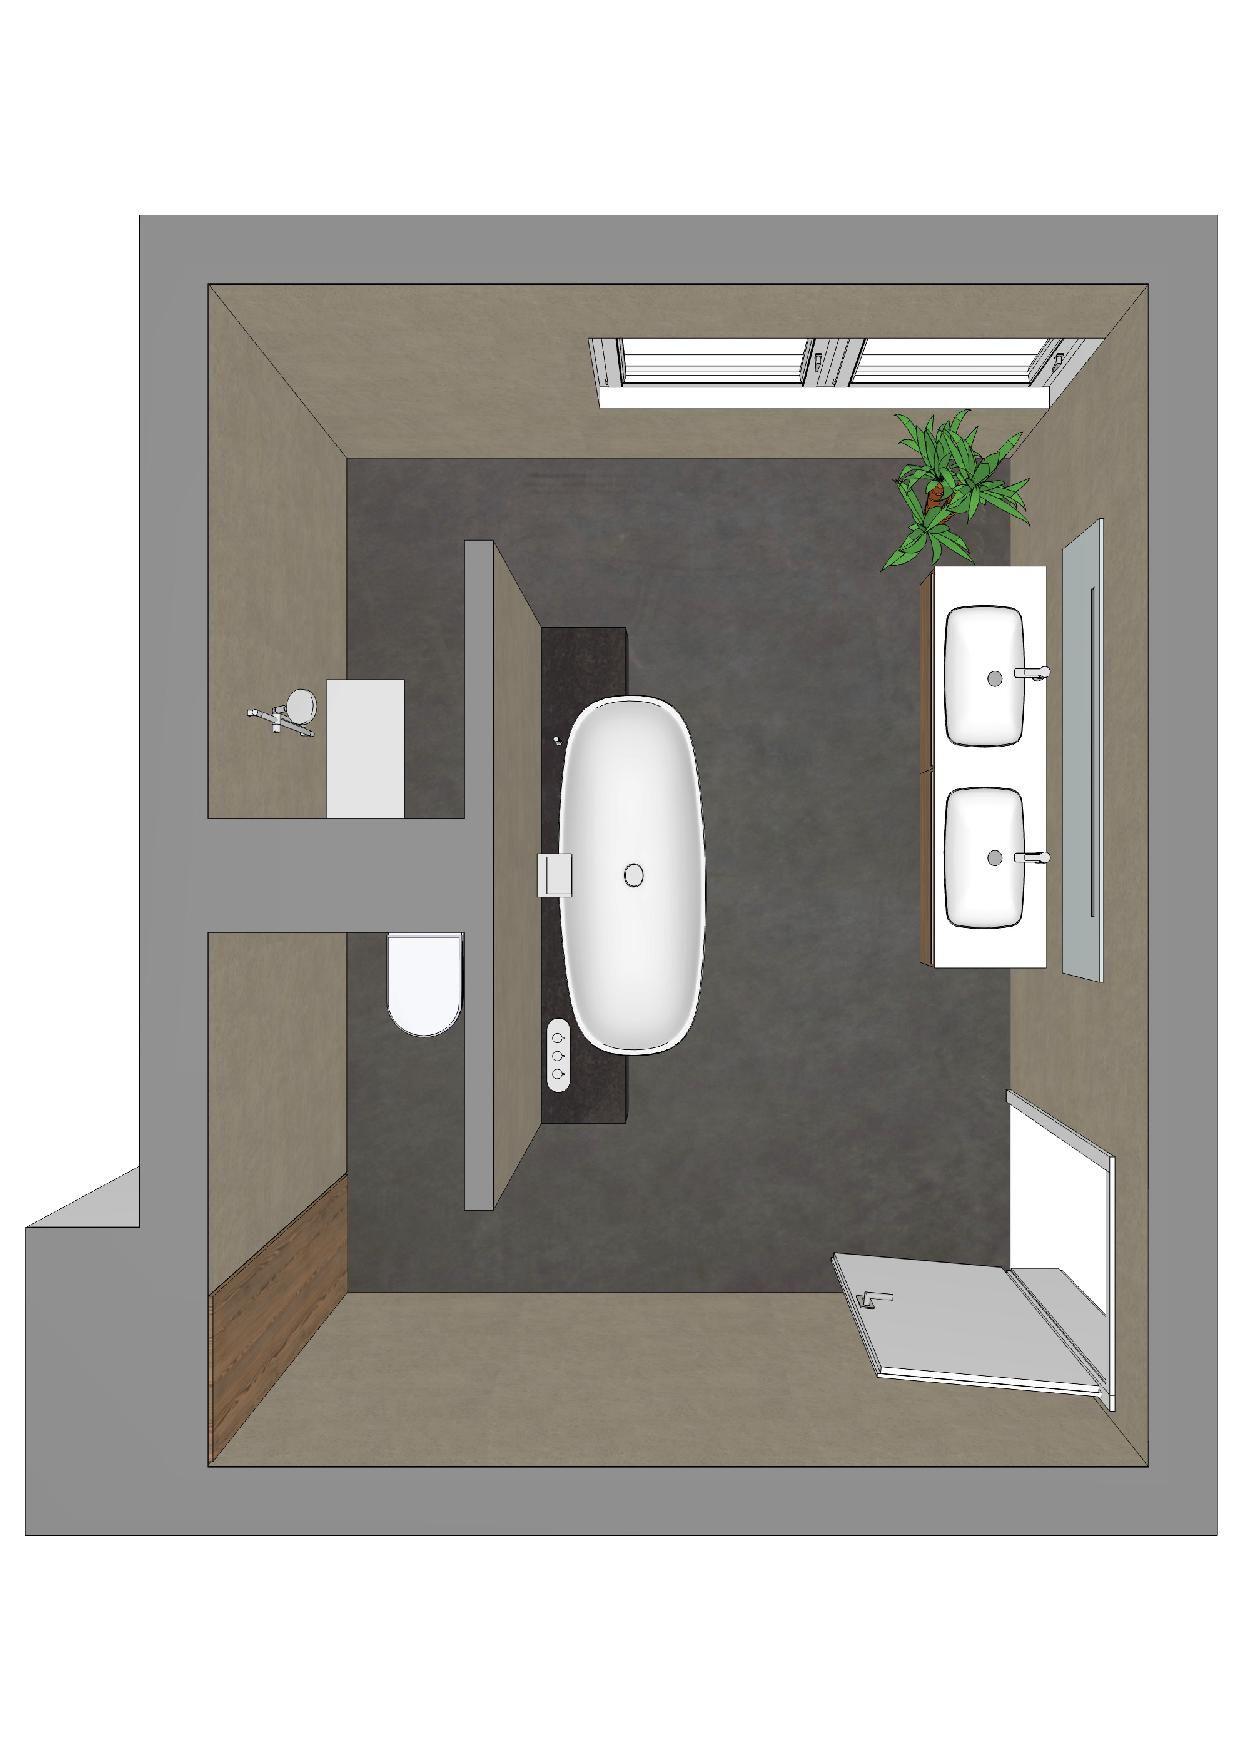 Badezimmerplanung mit T-Lösung | Inspiration - BAD-Oase! | Pinterest ...